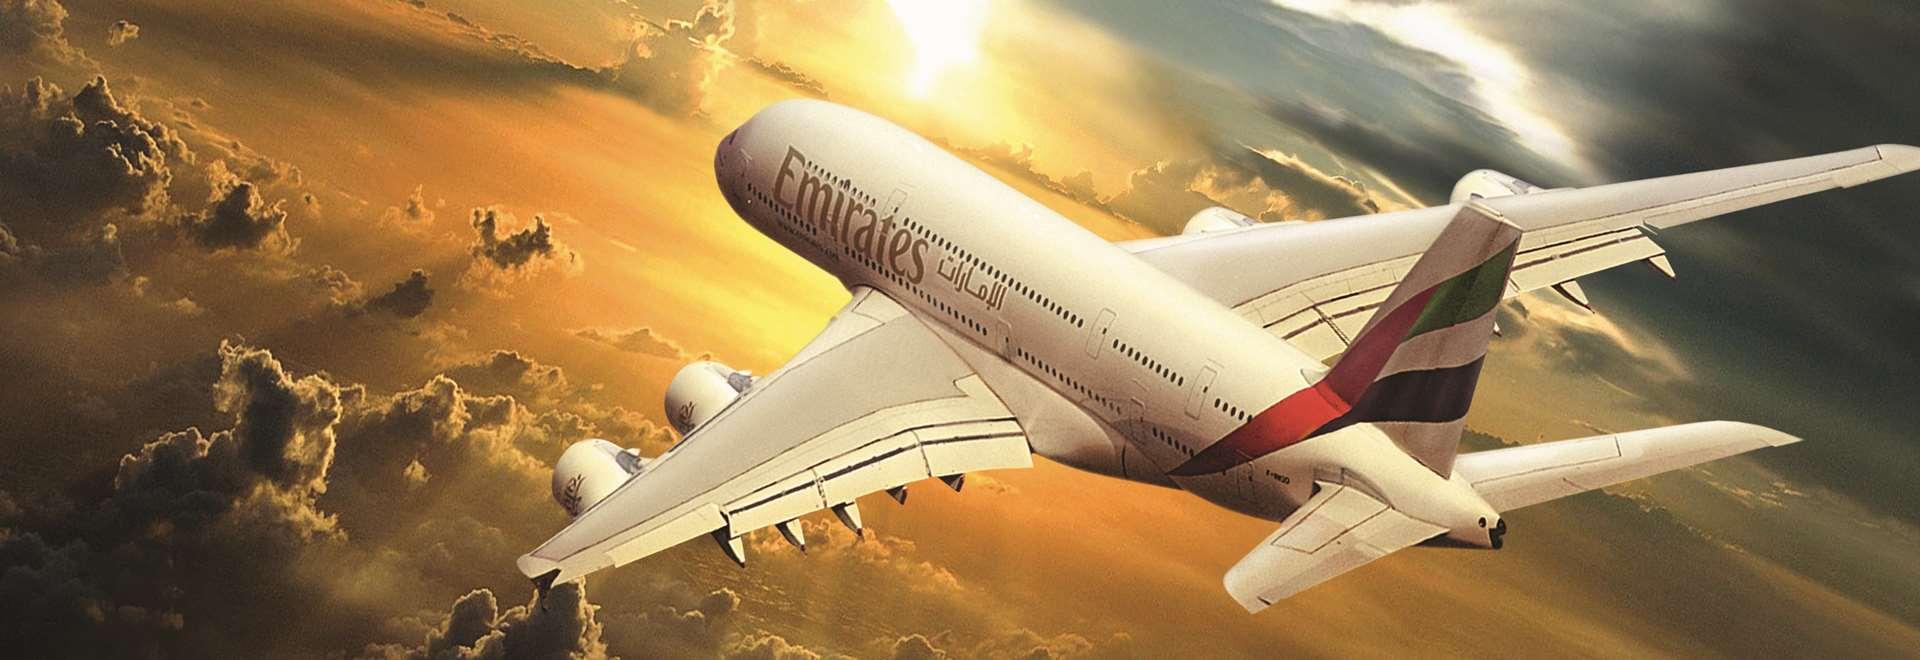 Emirates flights | Netflights